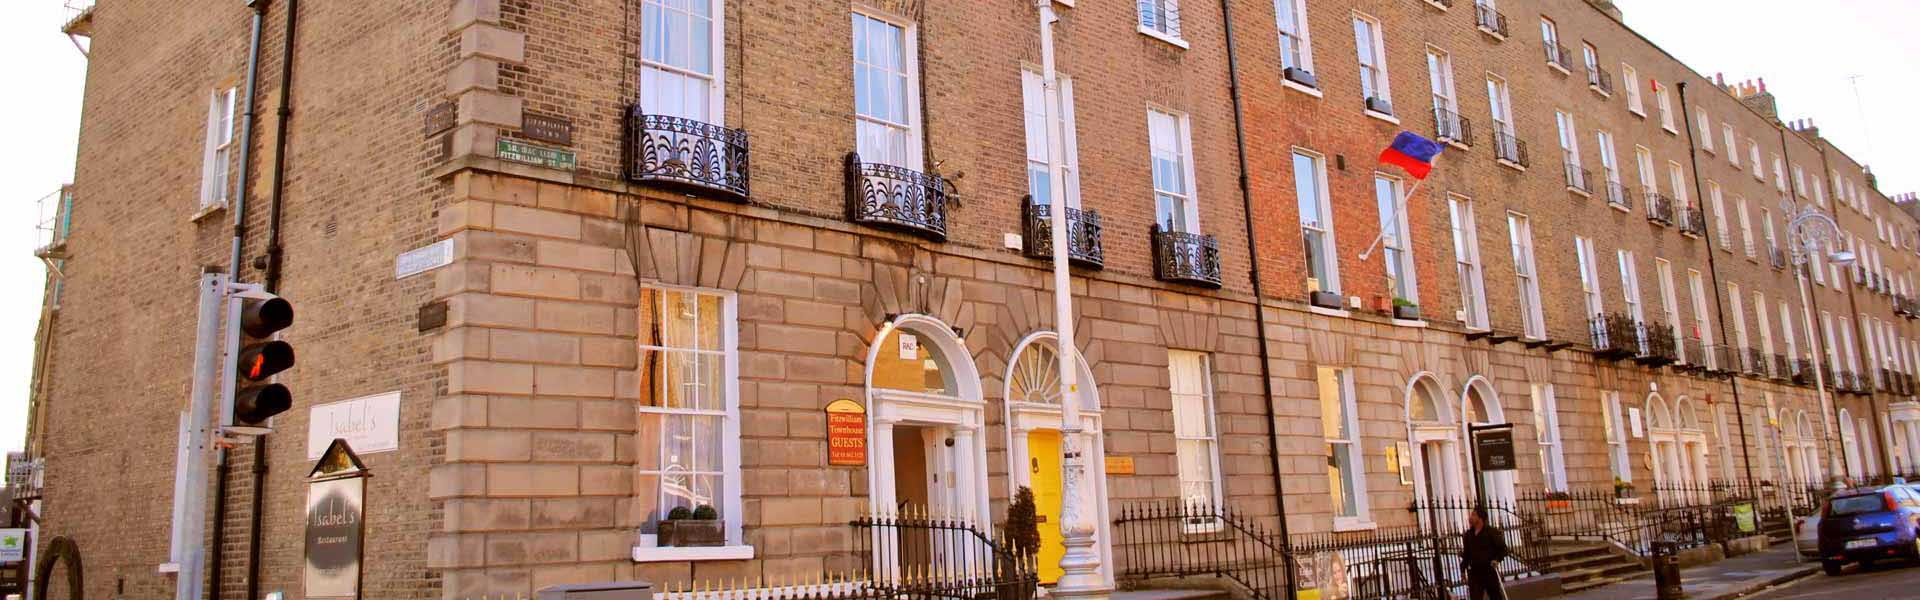 Fitzwilliam Townhouse B&B in Dublin City Centre   3 Star